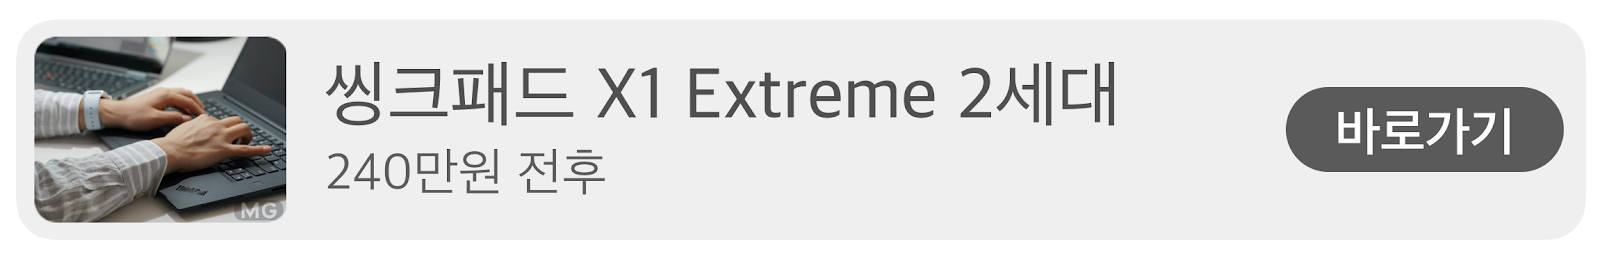 thinkpad-x-series/X1-Extreme-Gen-2/p/22TP2TXX1E2